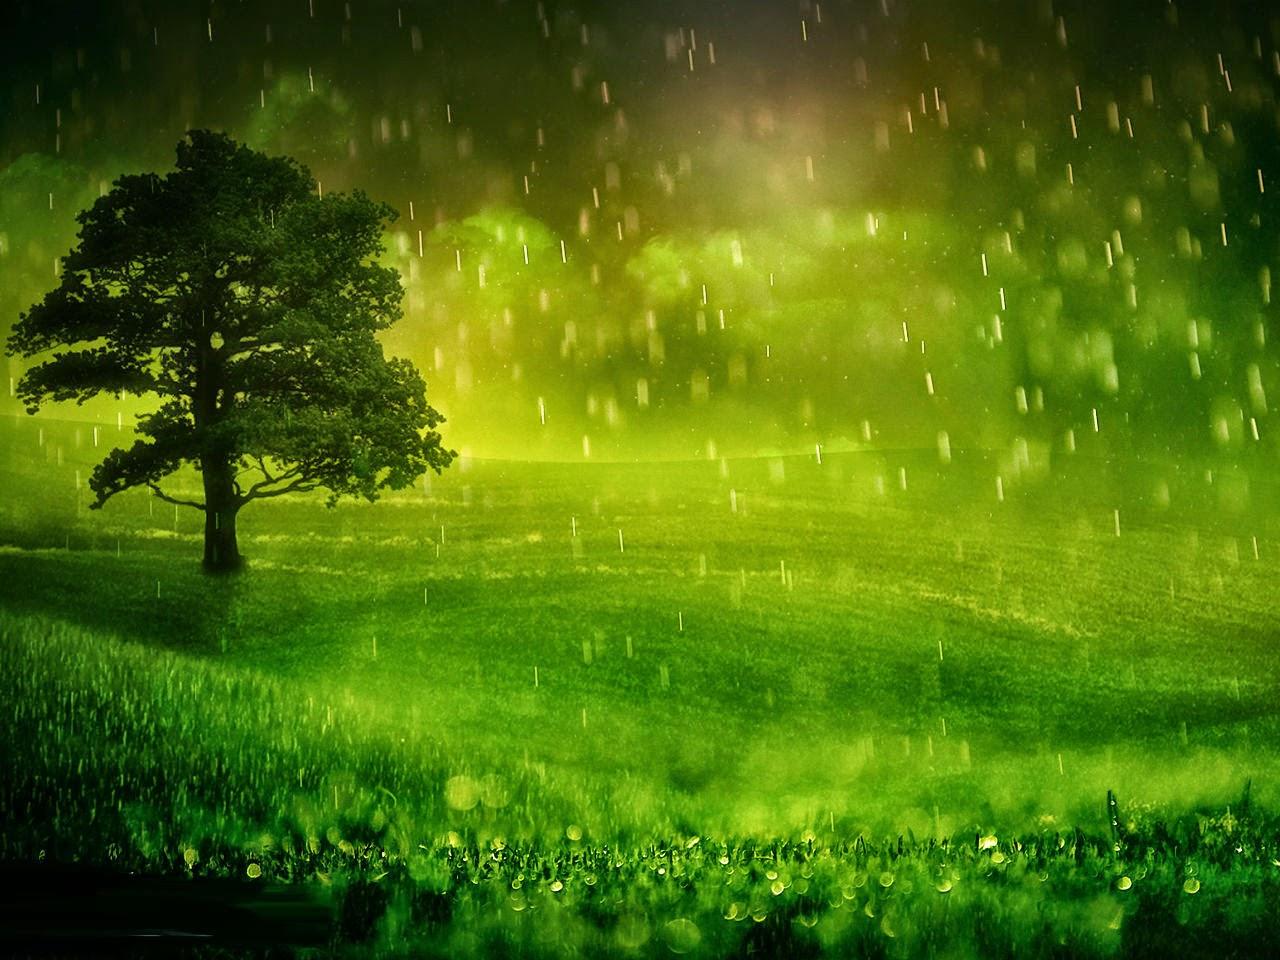 rain hd images for whatsapp impremedianet